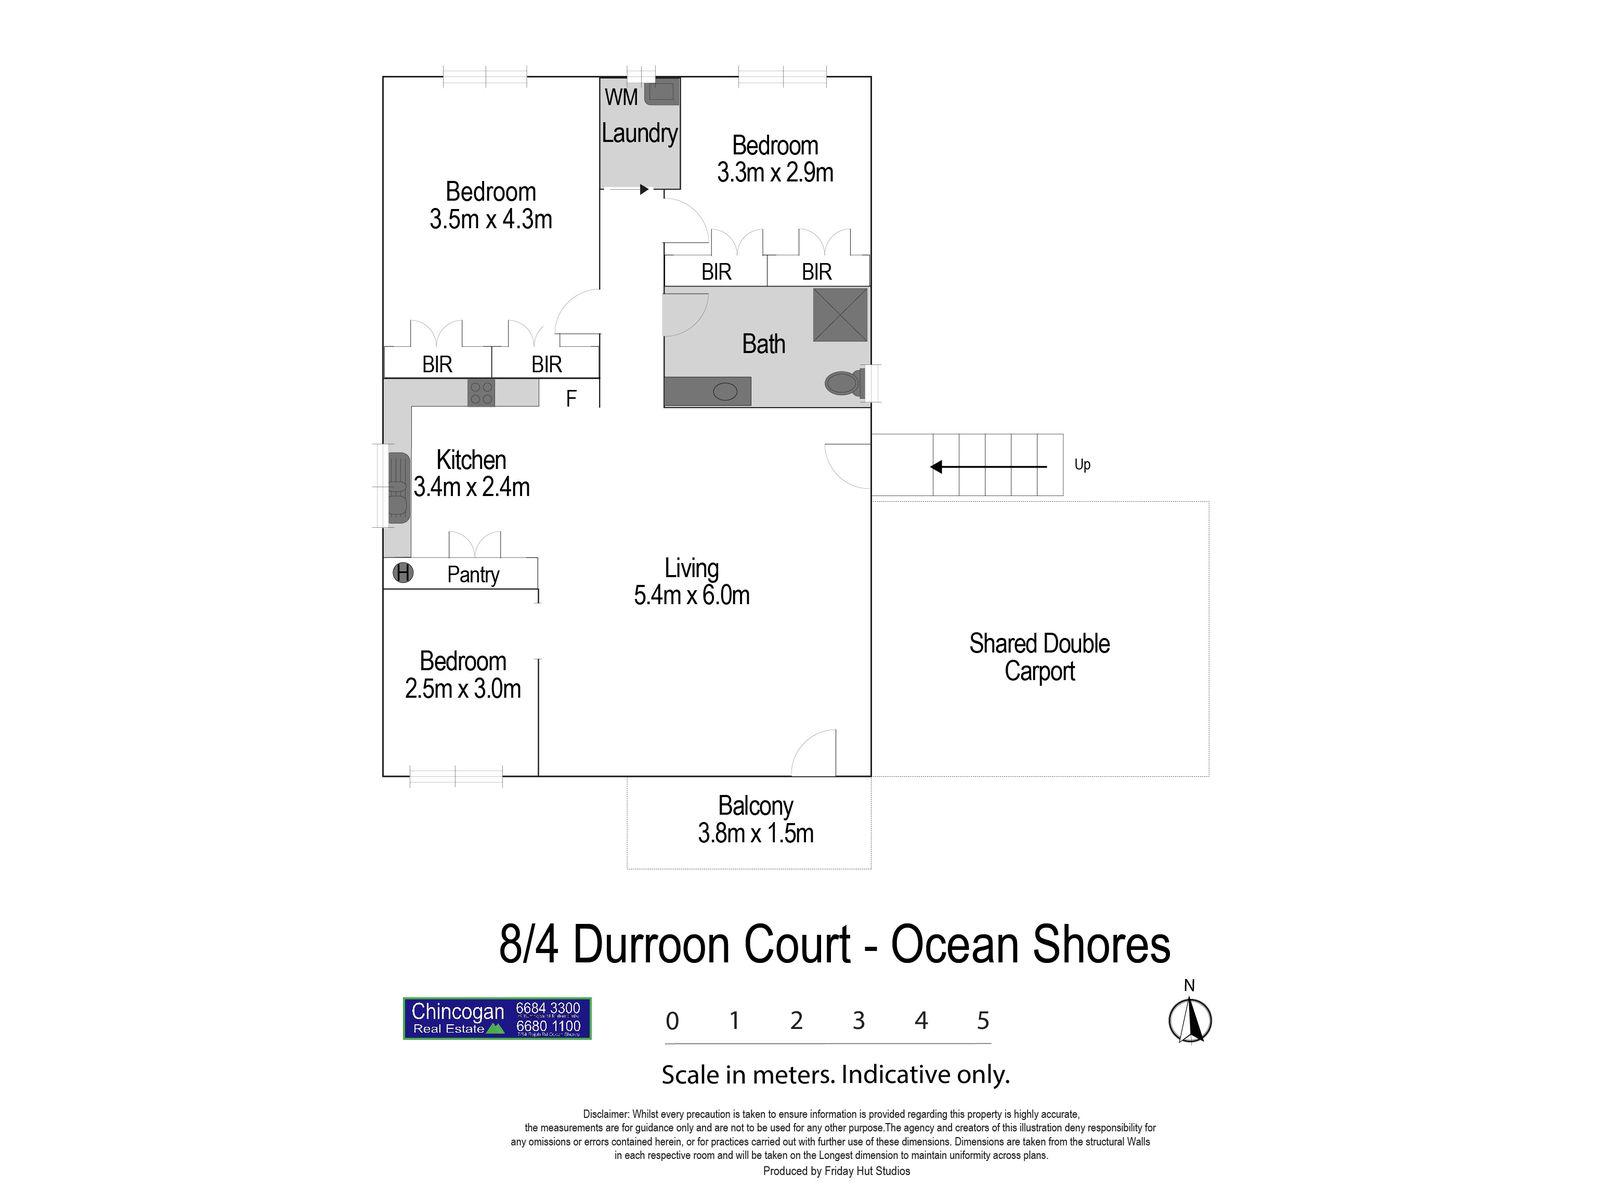 8 / 4 Durroon Court, Ocean Shores